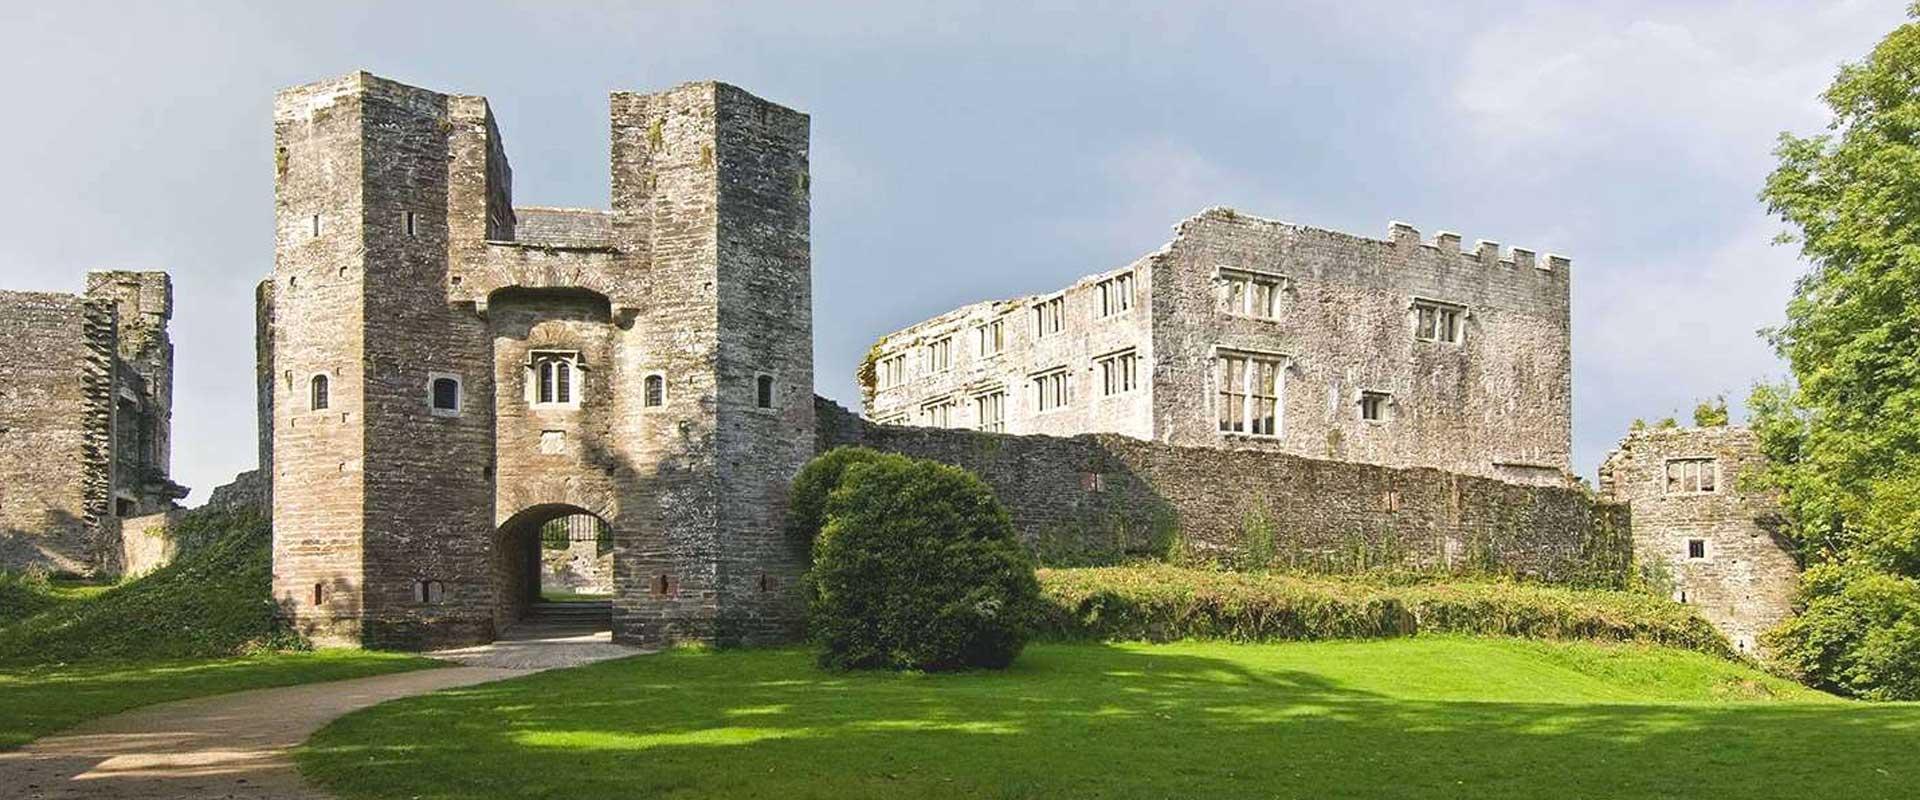 Berry Pomeroy Castle – Devon – 7.69 miles